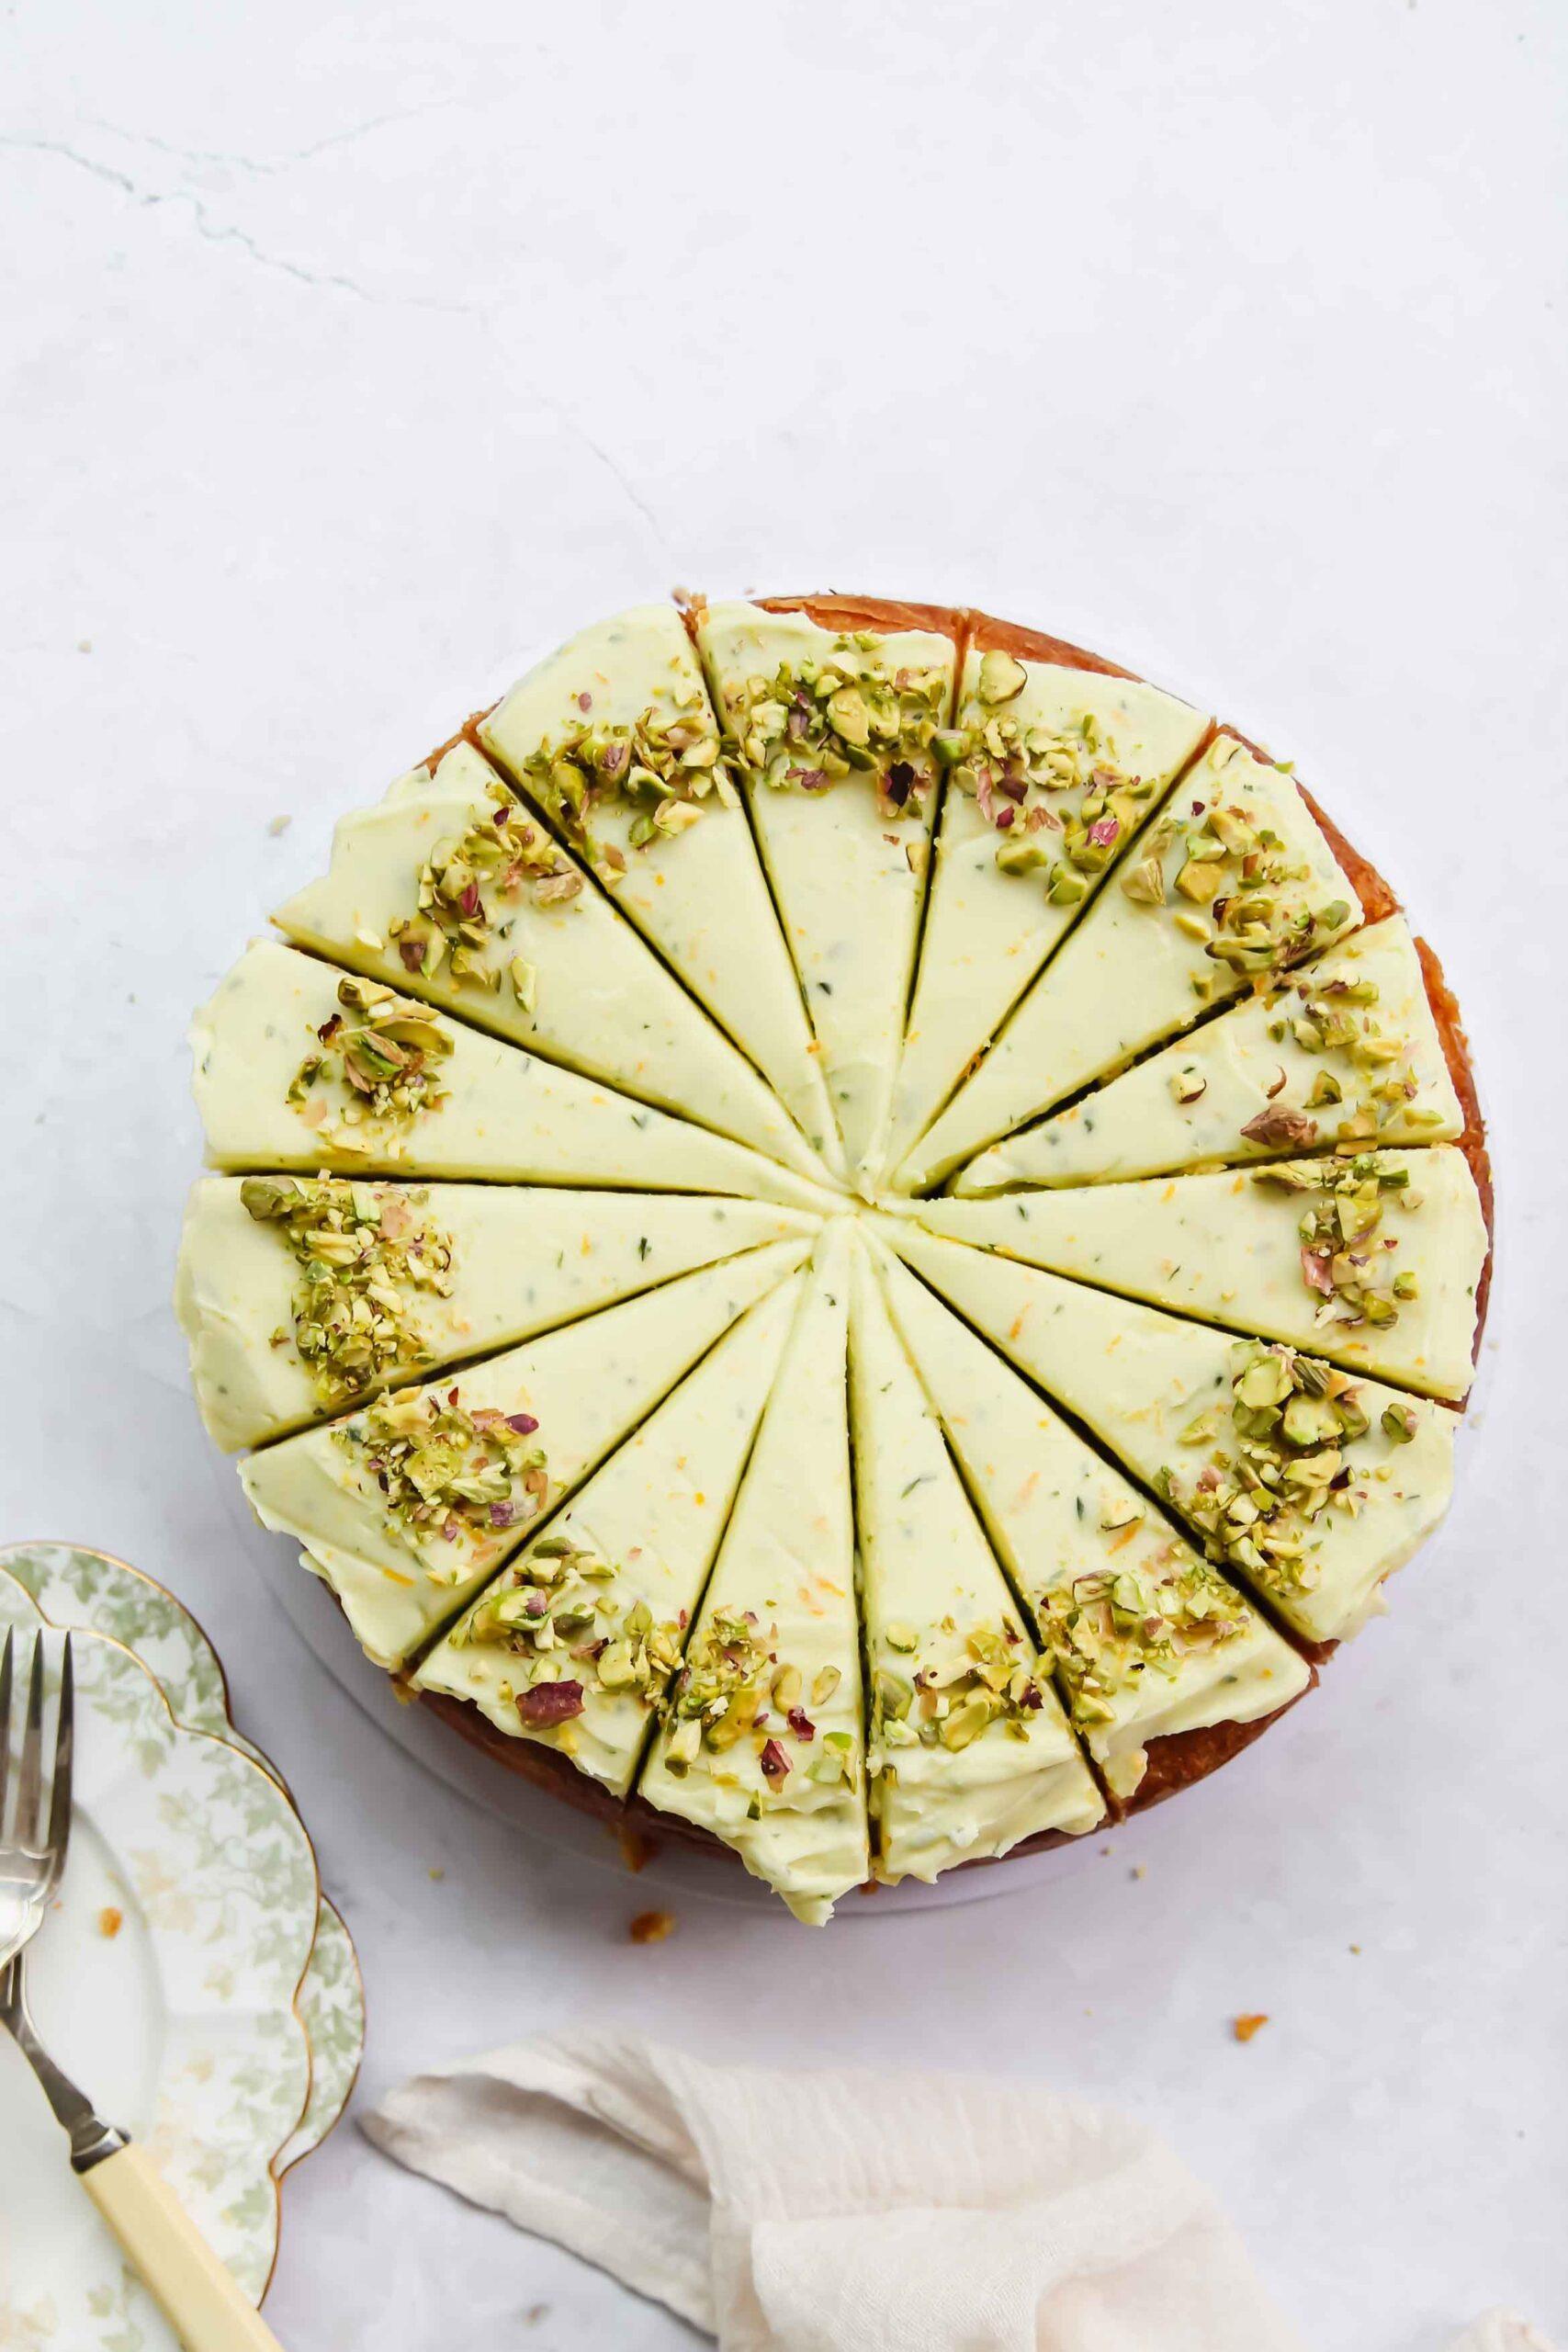 Orange Almond Cake with Basil Icing